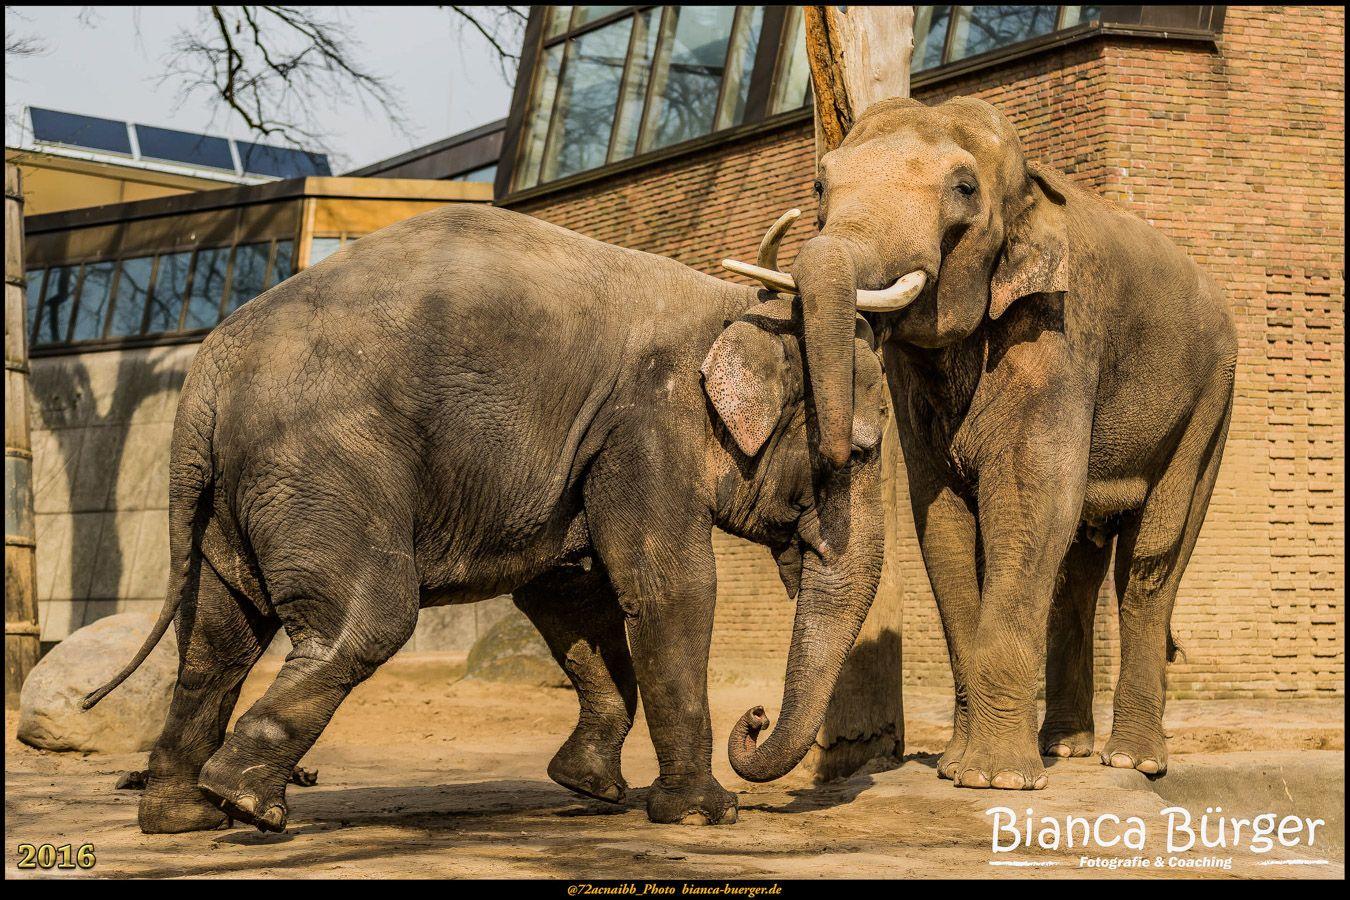 Zoo Berlin 4 - Elefanten #ZooBerlin #Zoo #Berlin #Deutschland #Germany #biancabuergerphotography #igersgermany #igersberlin #IG_Deutschland #IG_Berlin #ig_germany #shootcamp #shootcamp_ig #canon #canondeutschland #EOS5DMarkIII #5Diii #pickmotion #berlinbreeze #diewocheaufinstagram #berlingram #visit_berlin #Tiere #animals #elefant #elephant